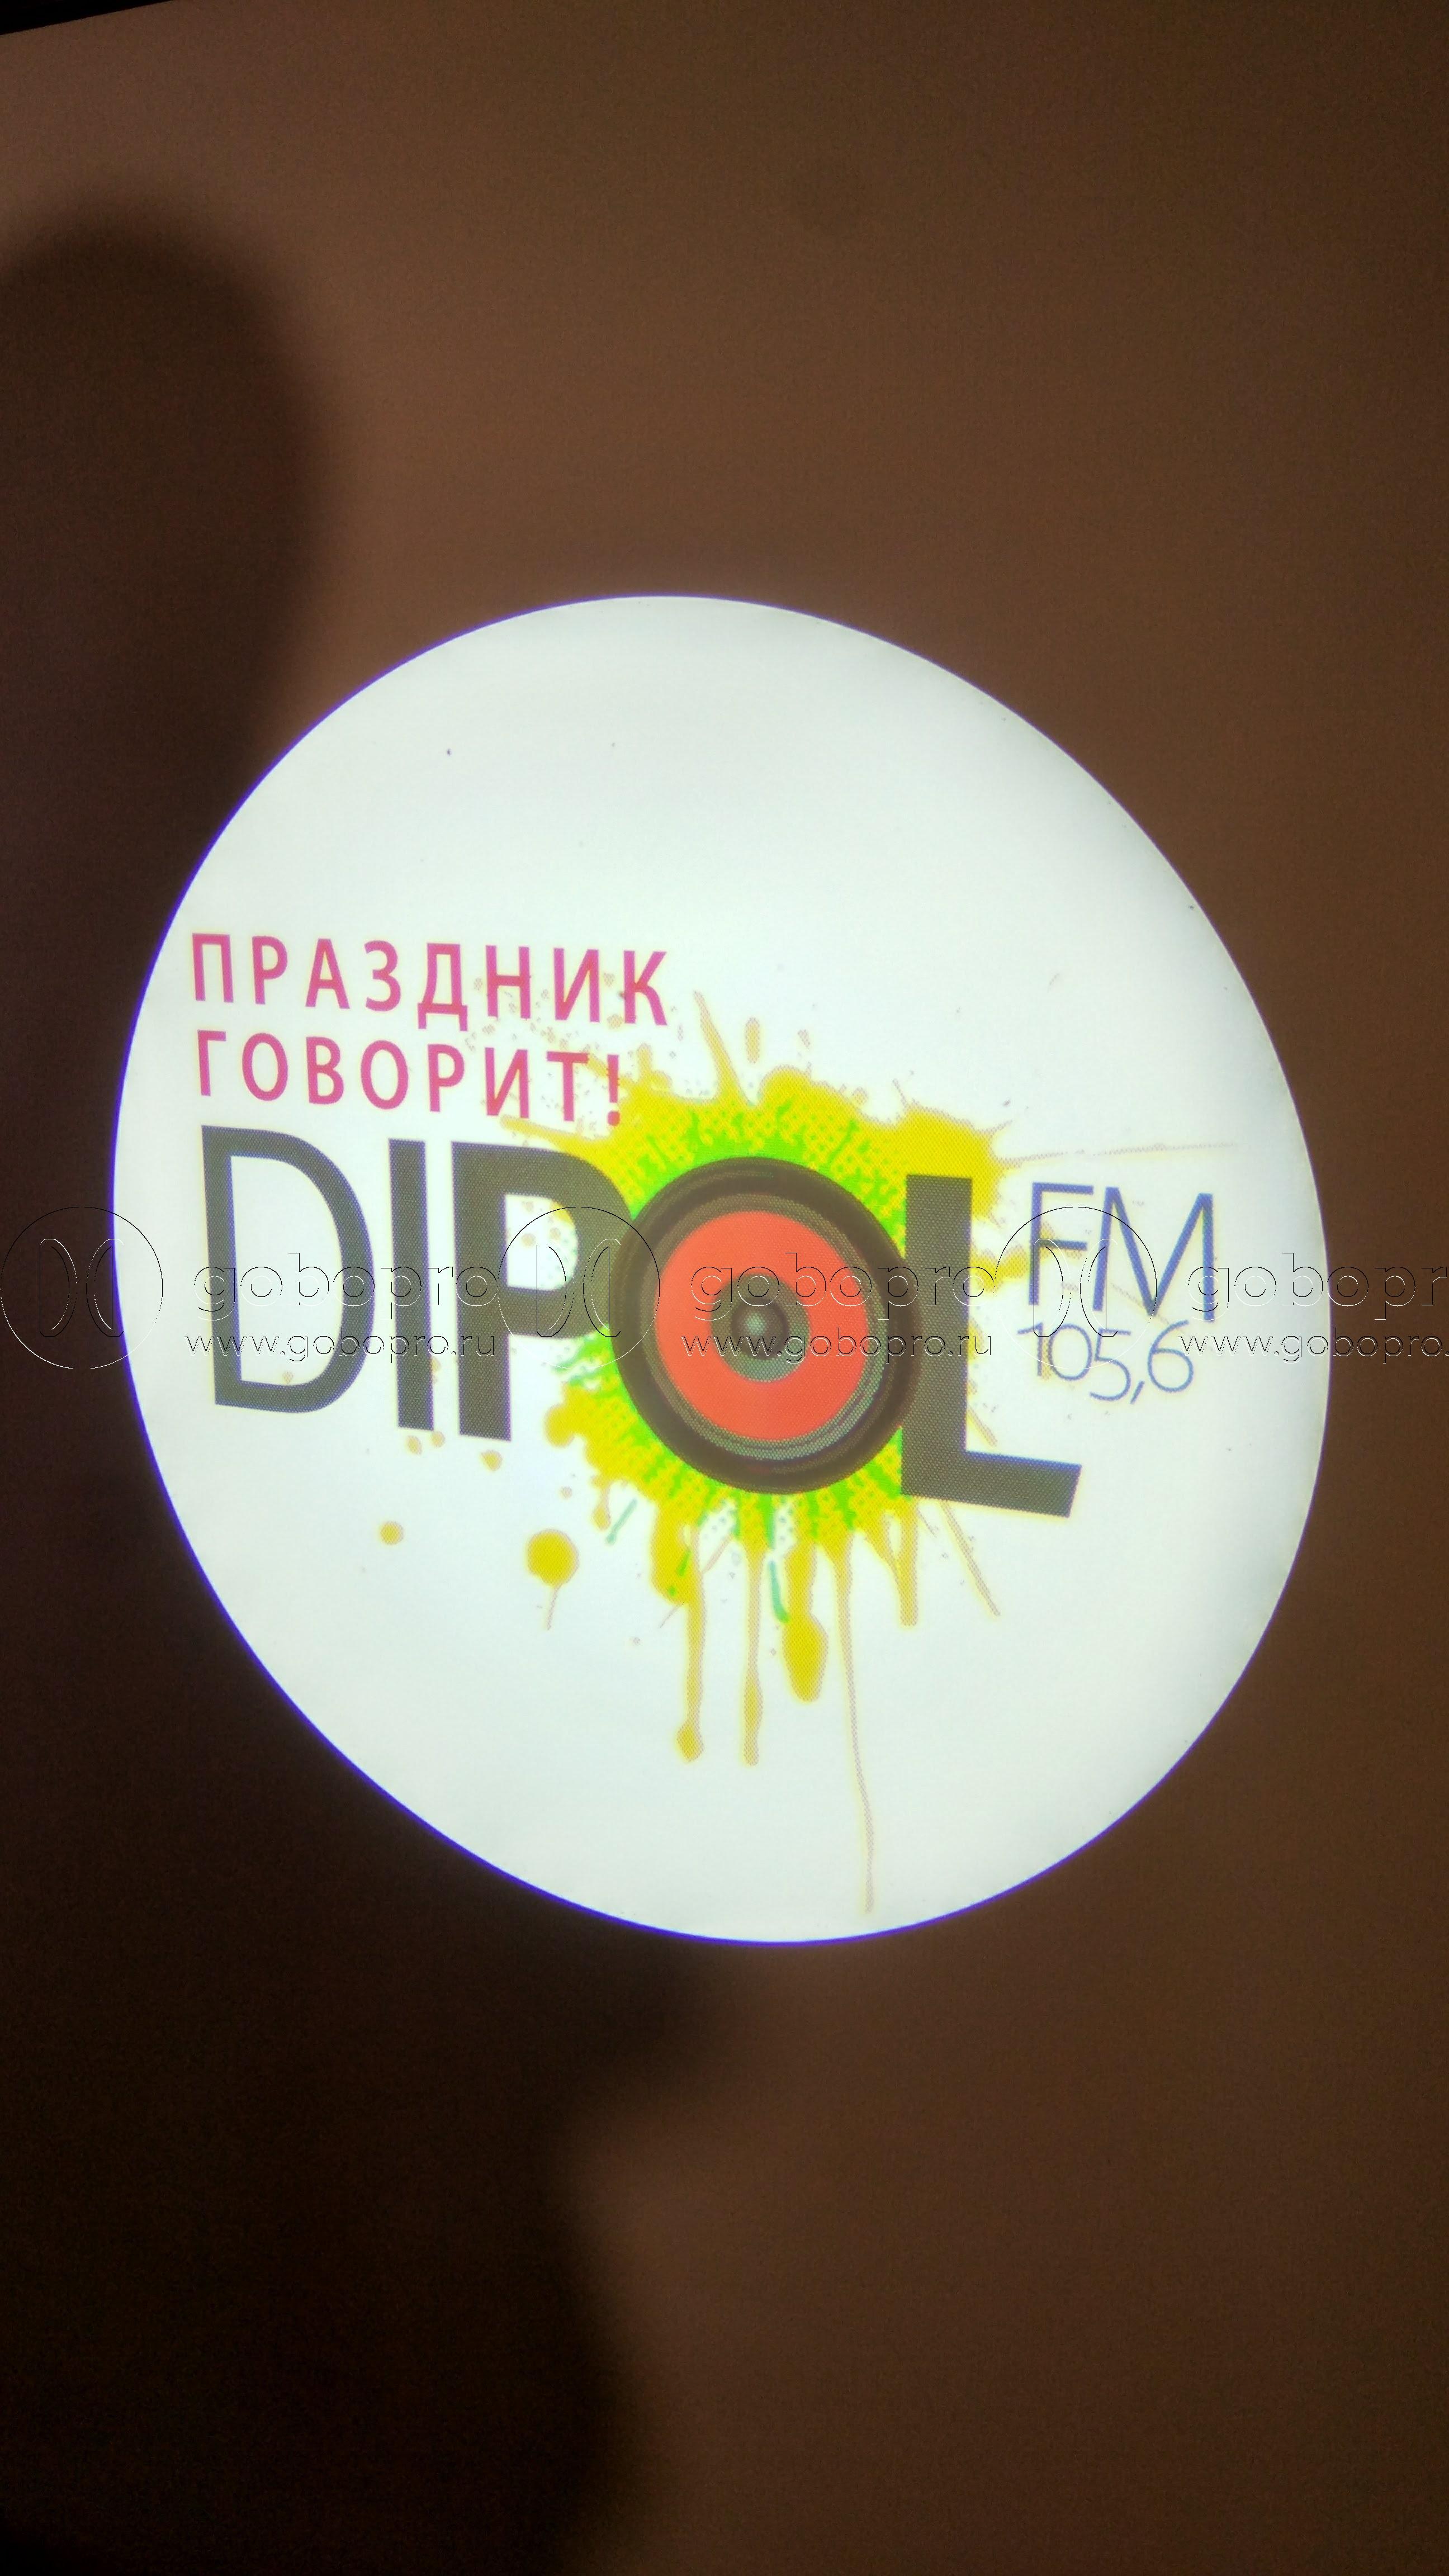 DipolFM